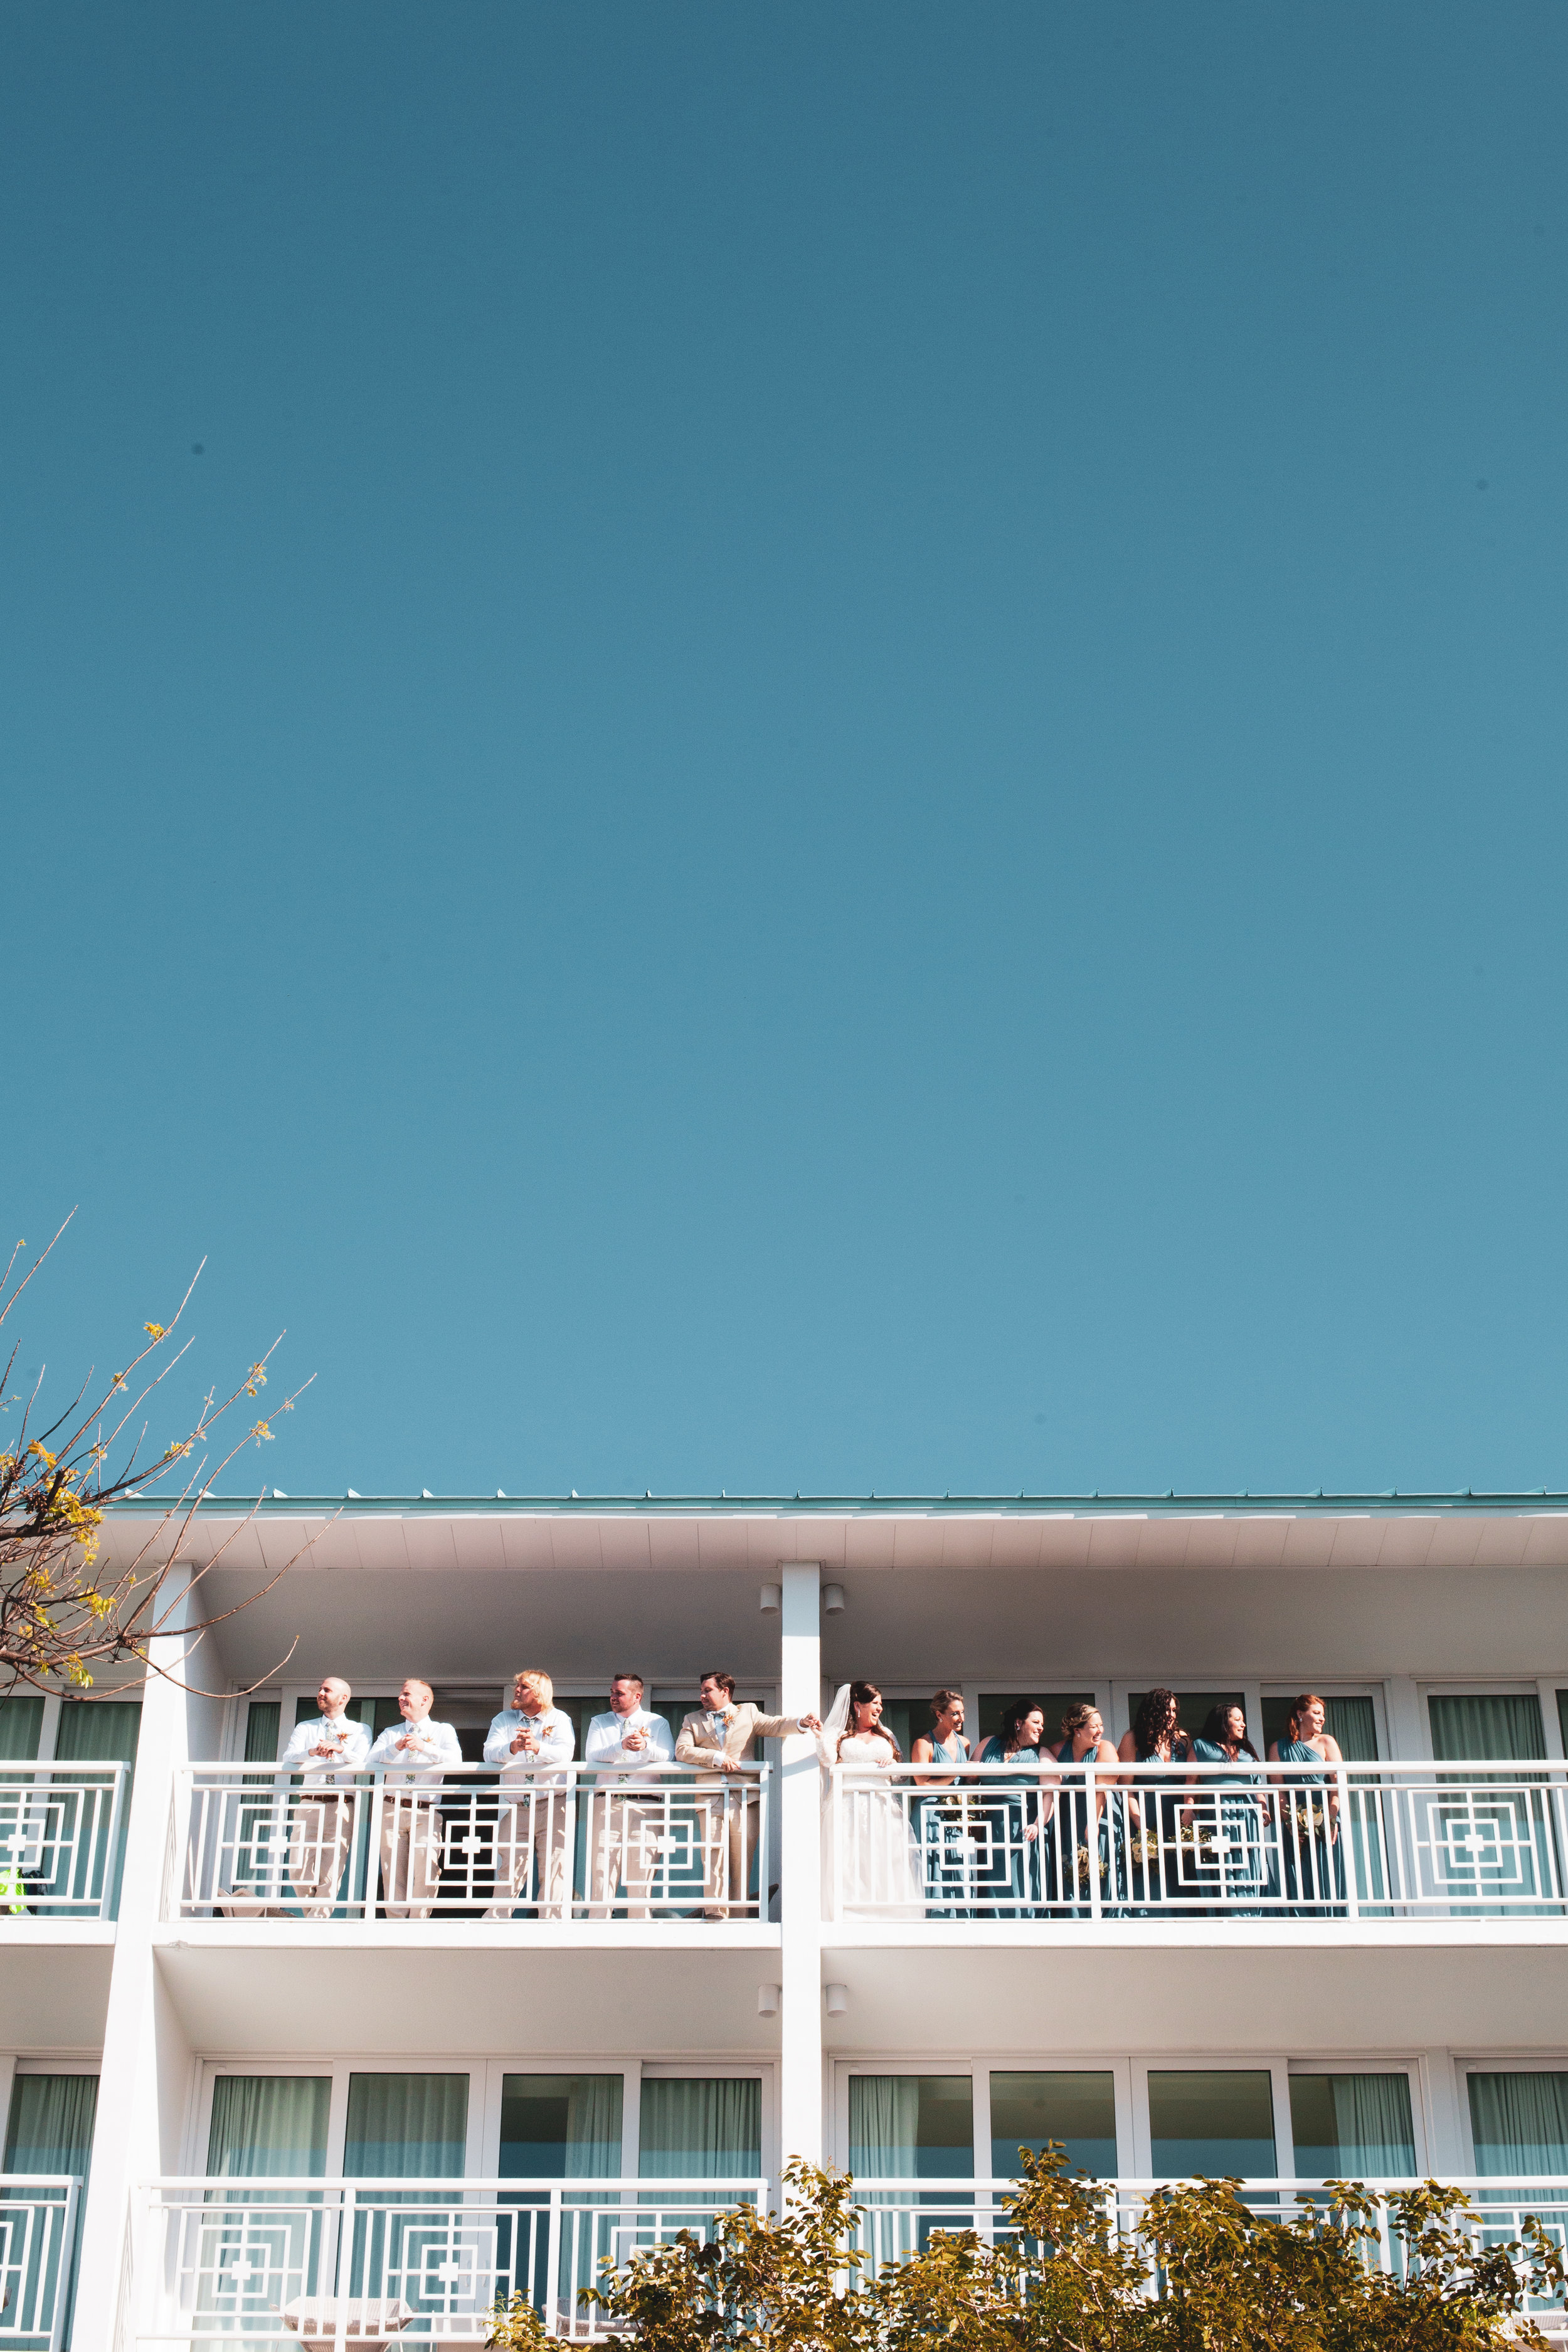 key largo florida beach wedding © kelilina photography 20190316161748-1.jpg